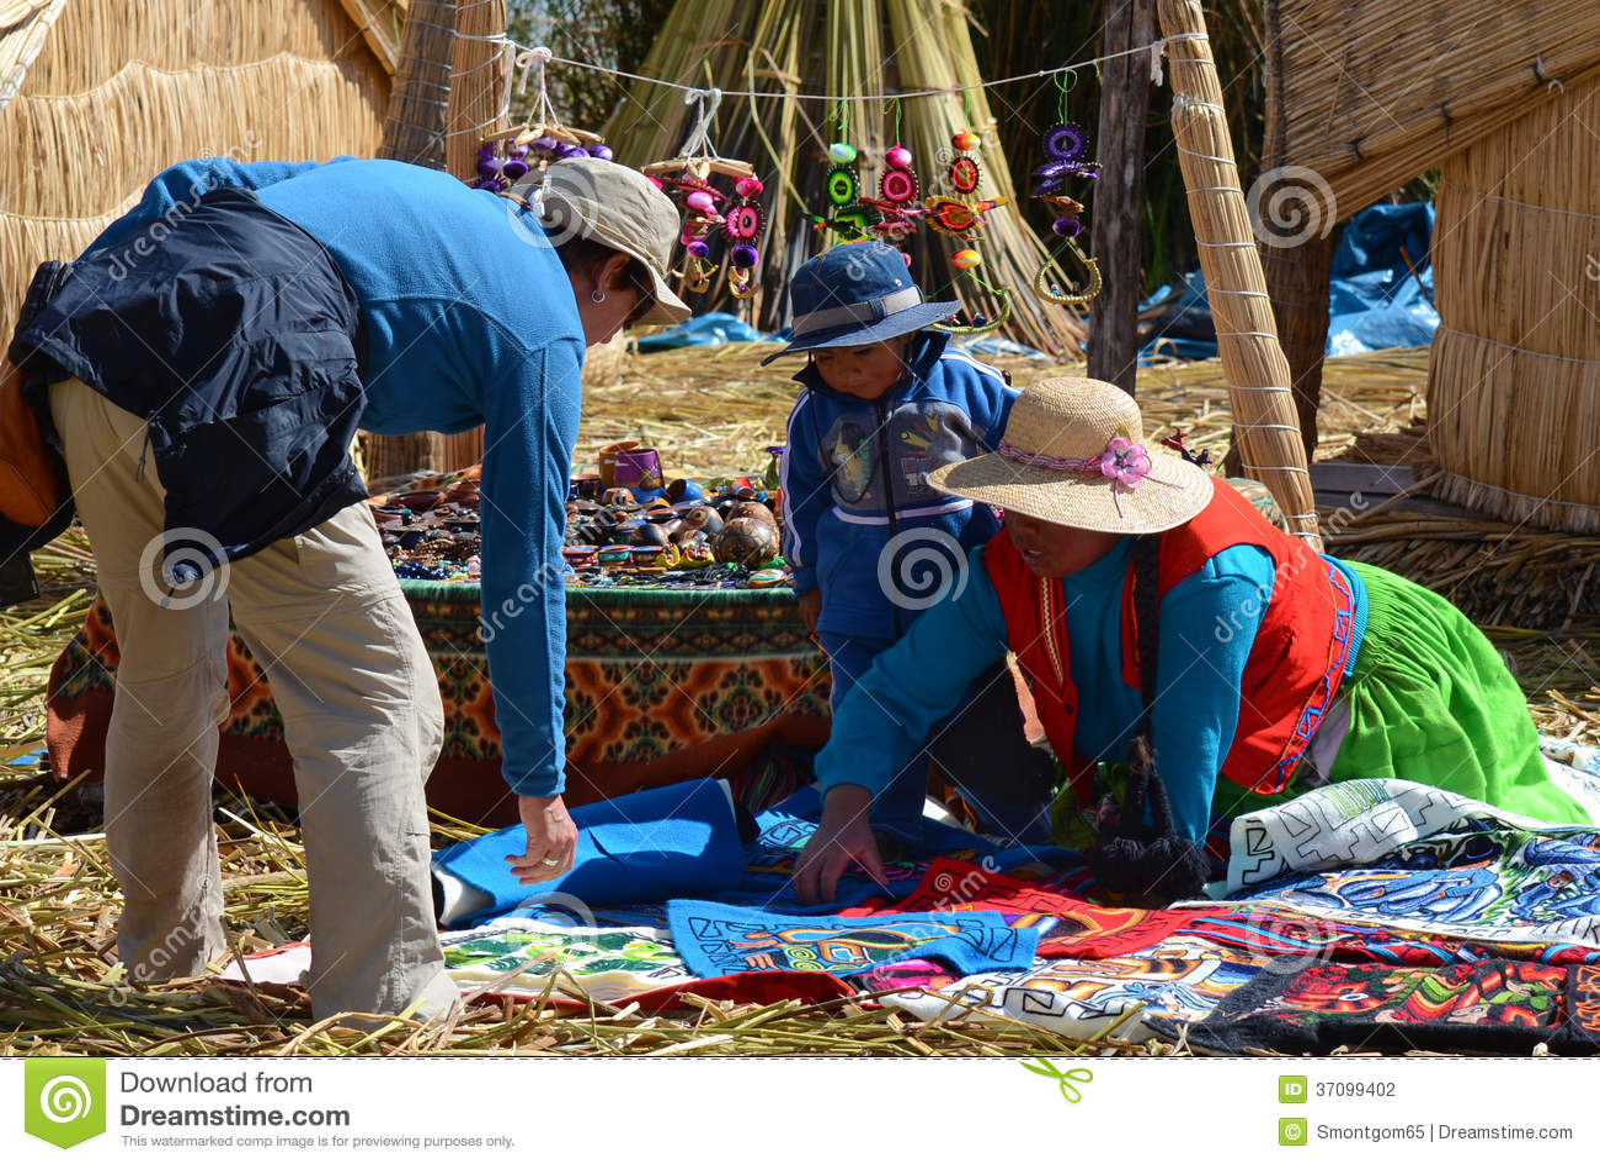 Lake Titicaca souvenir buying